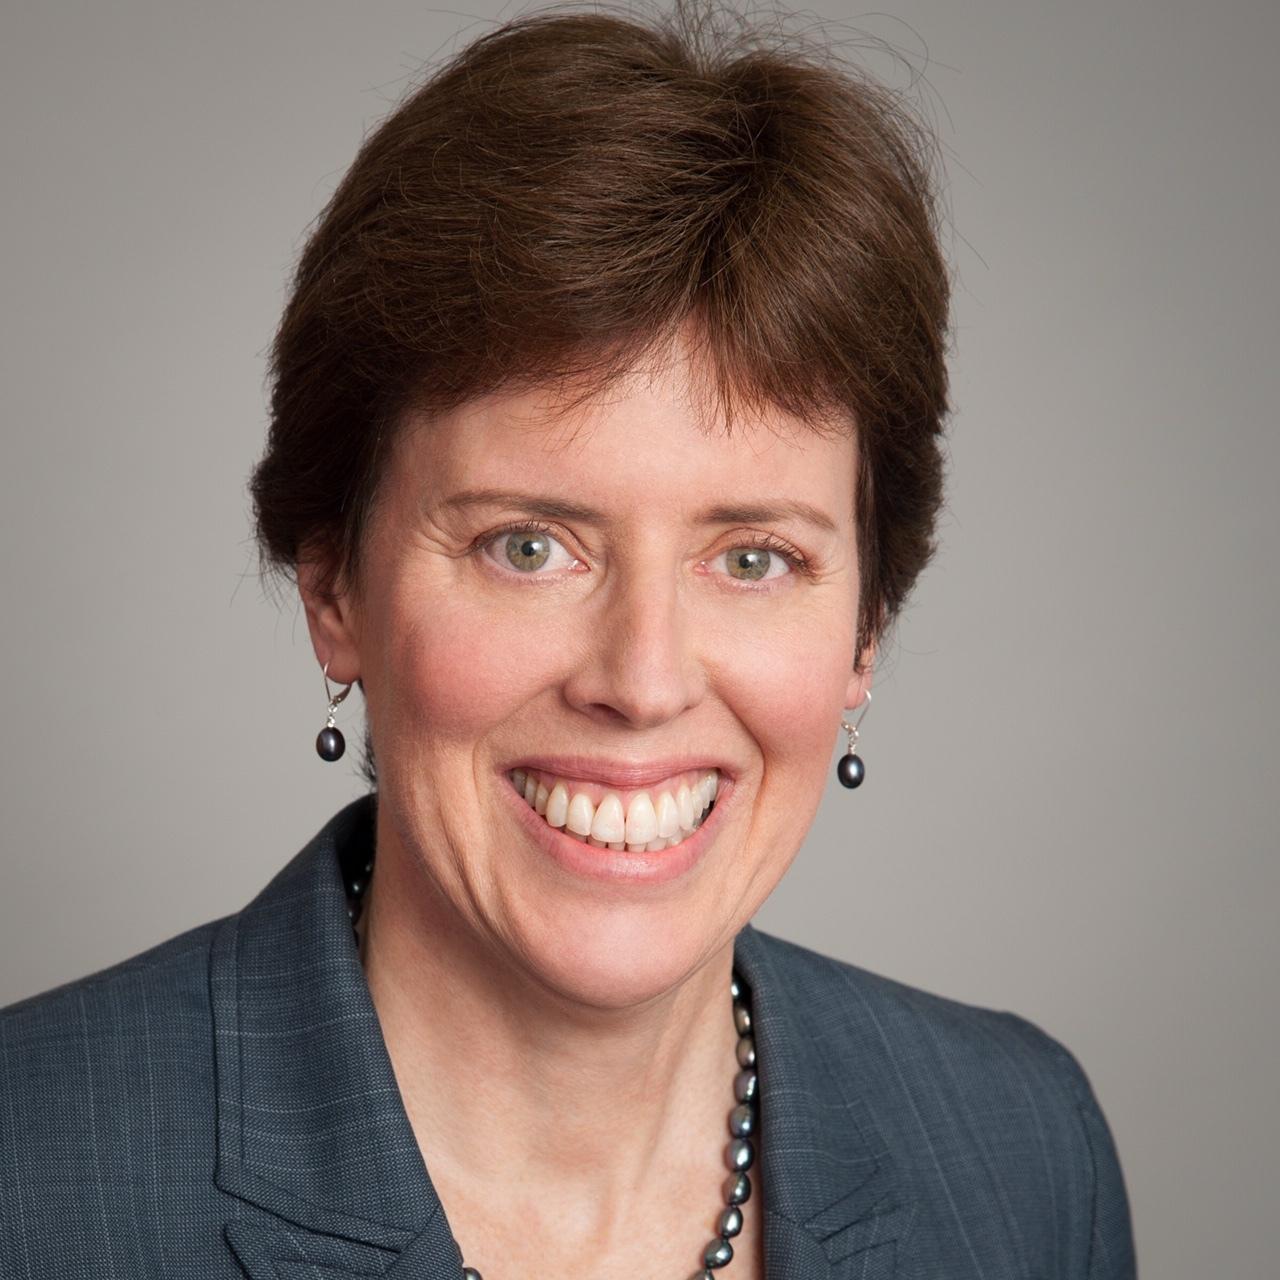 Dr. Joann Halpern